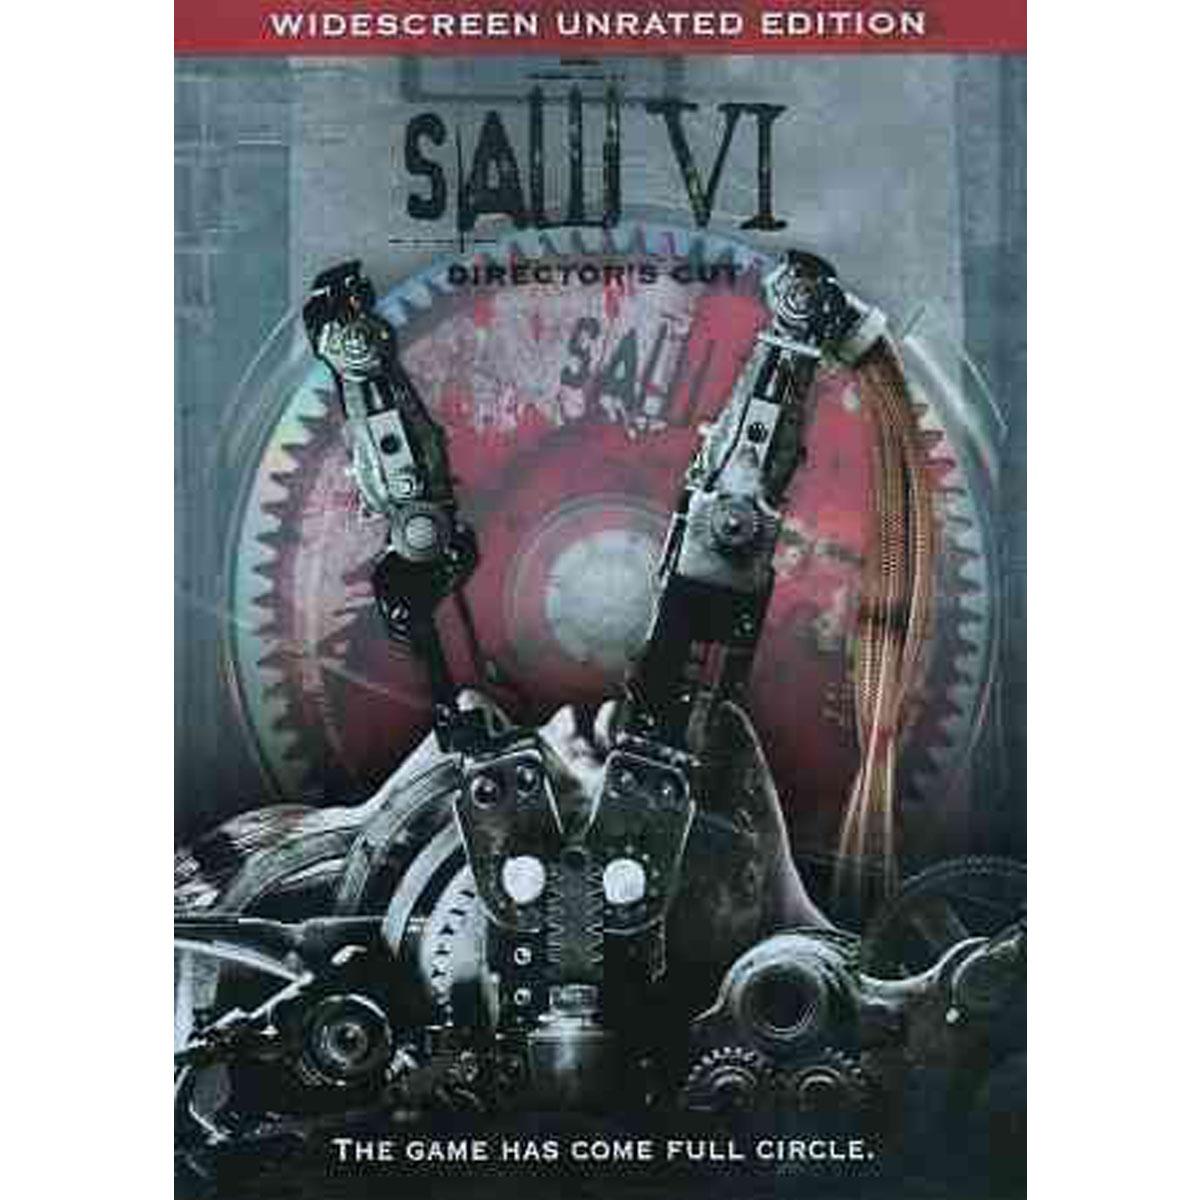 SAW 6 DVD